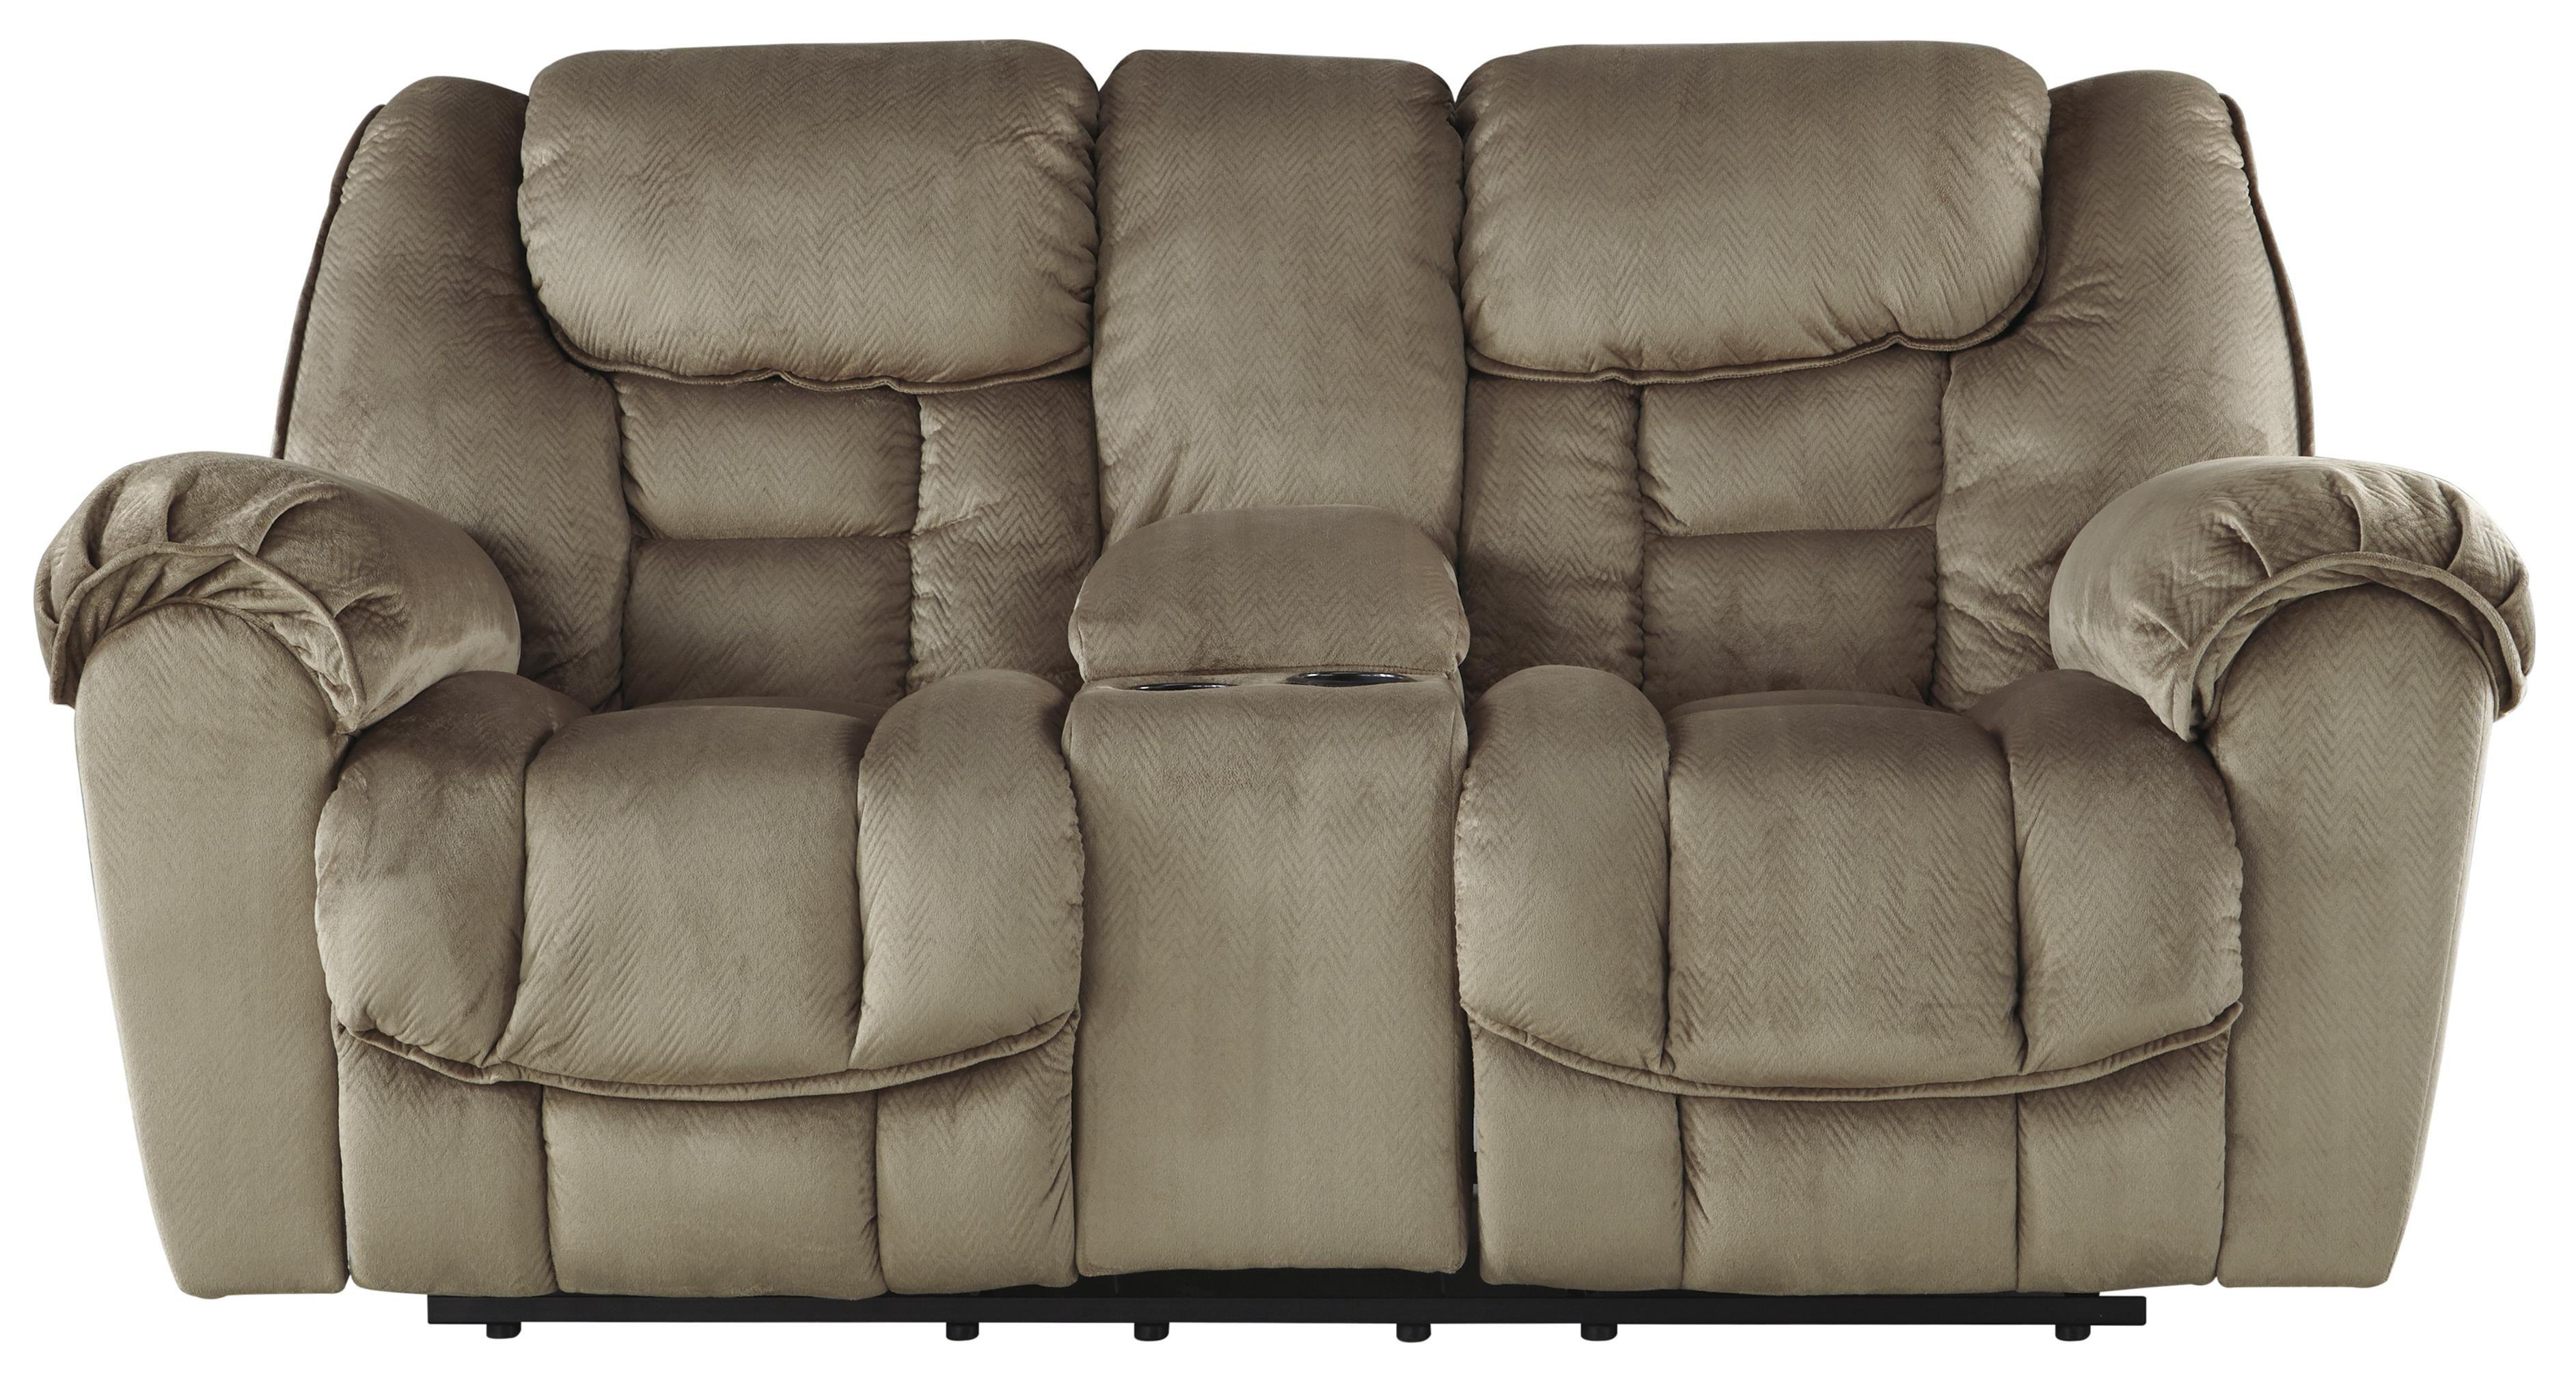 Fine Jodoca Glider Recl Power Loveseat W Console By Benchcraft Alphanode Cool Chair Designs And Ideas Alphanodeonline